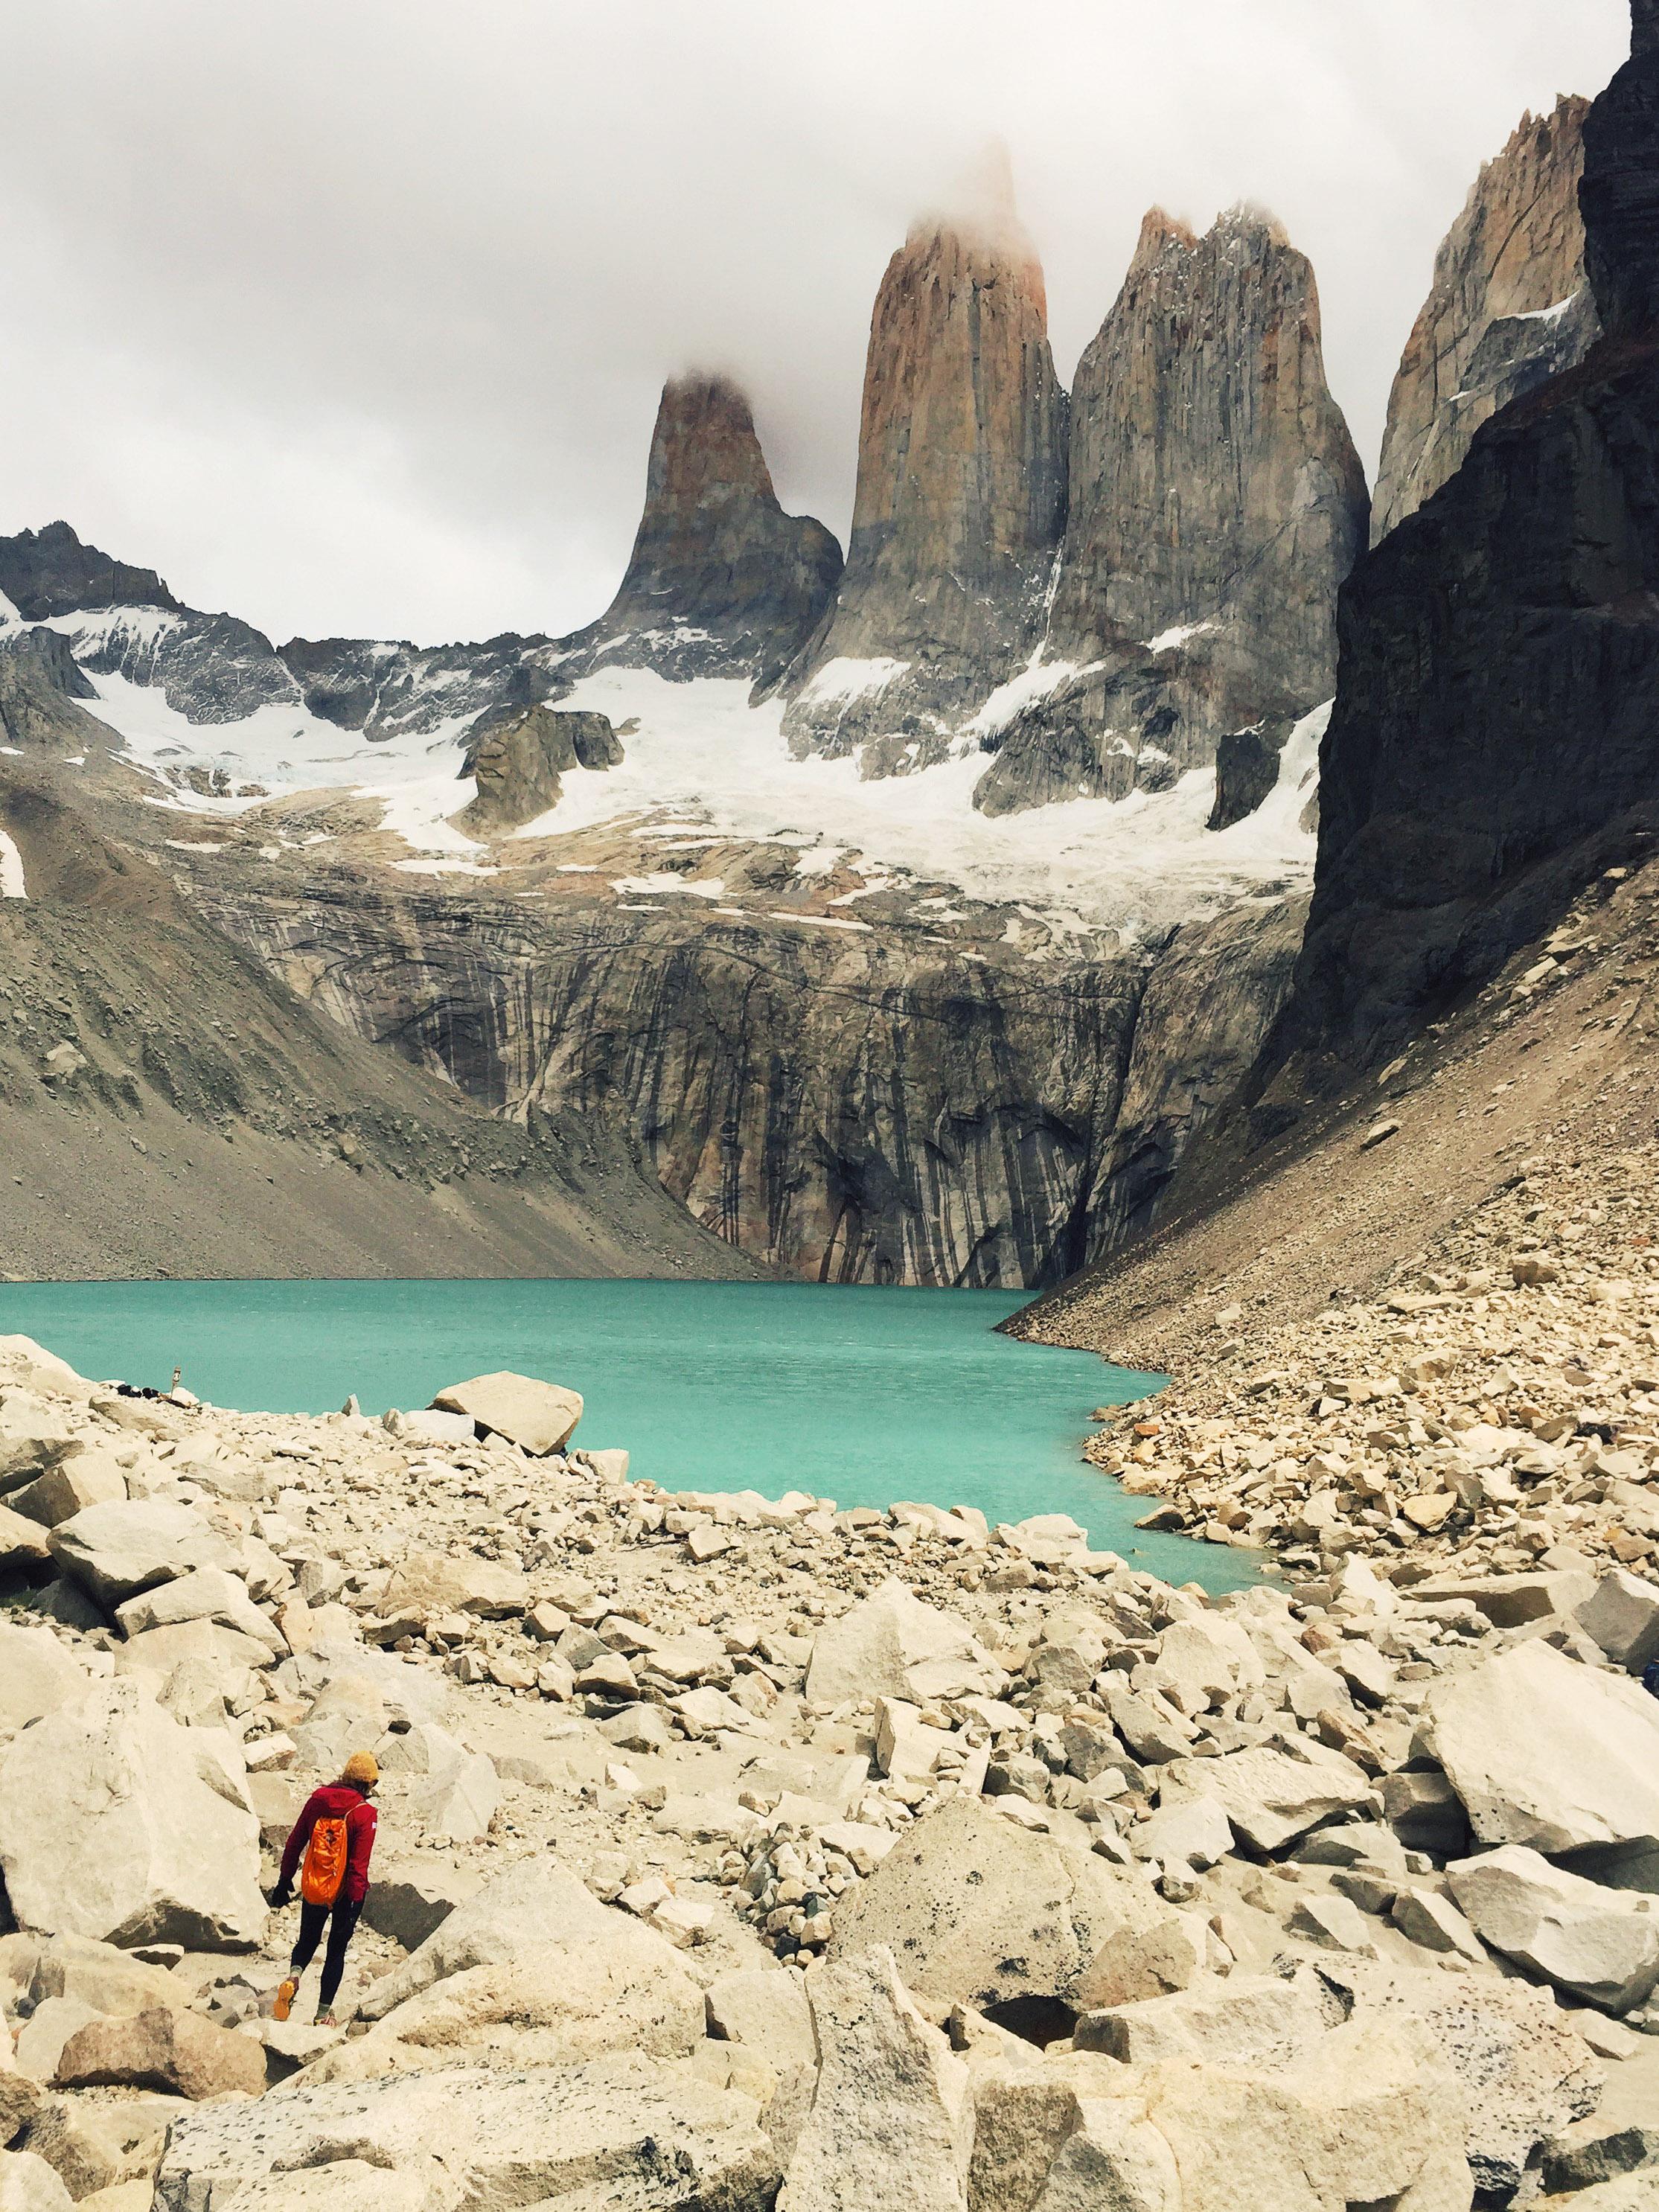 patagonia_2014-1-3.jpg